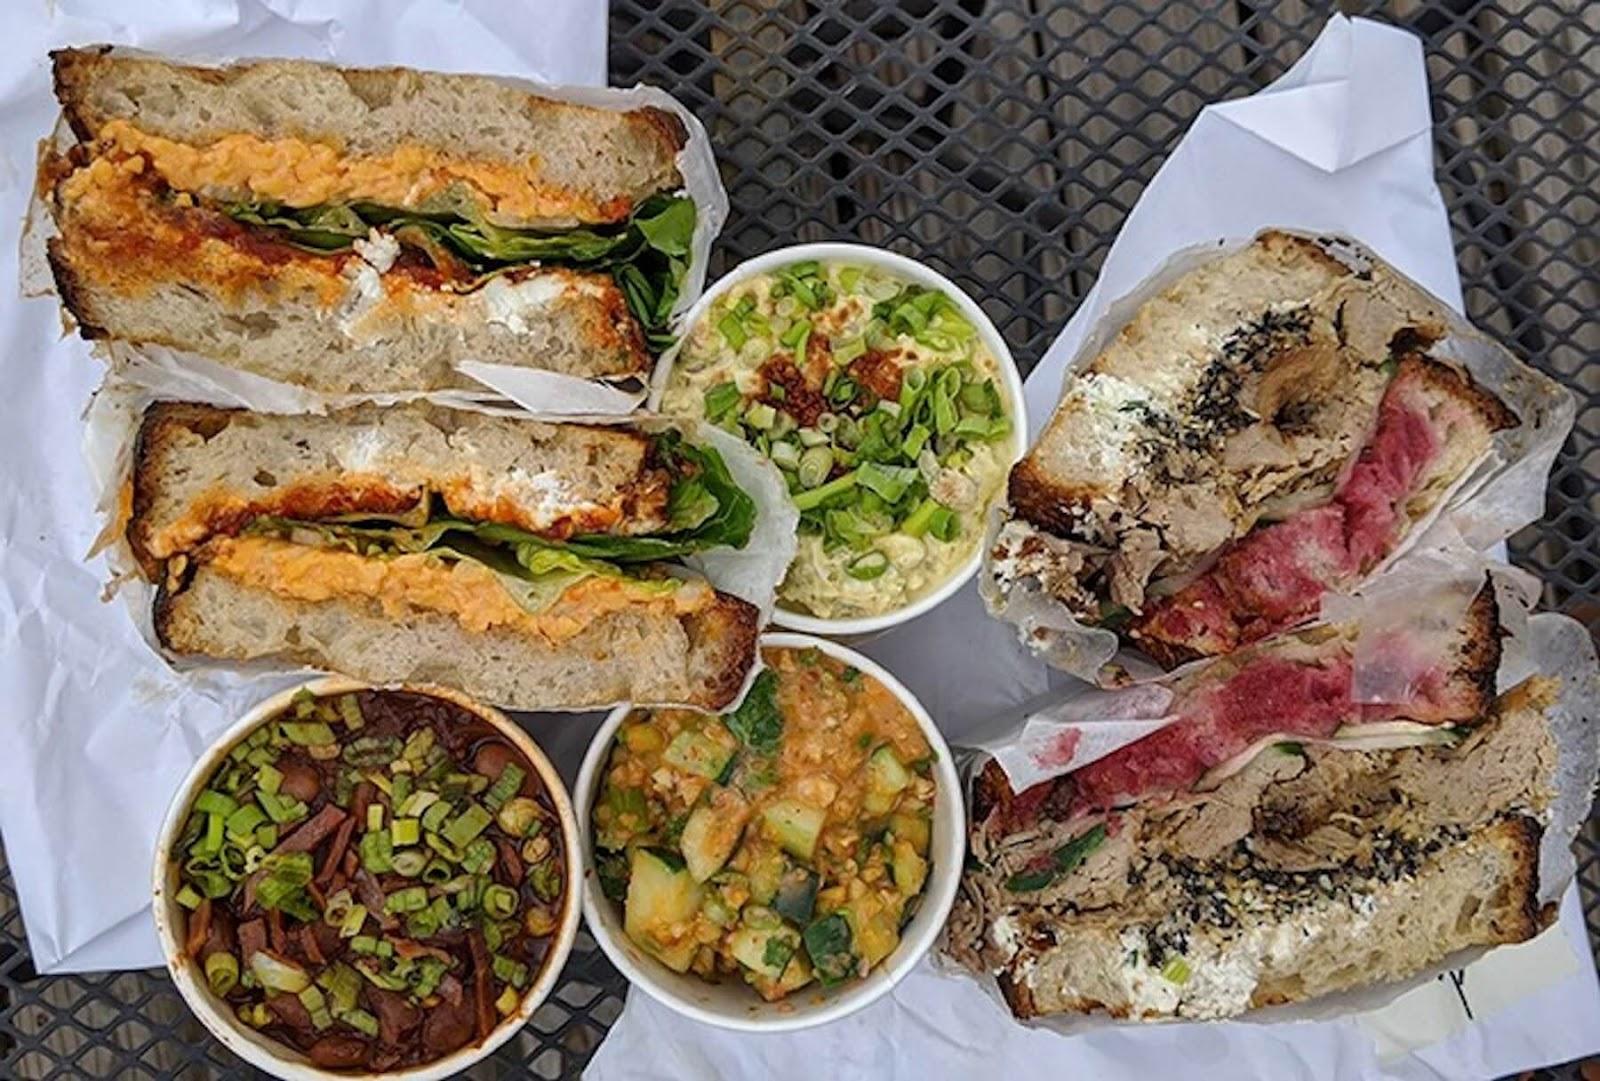 food from Duncan Street Sandwich Shop